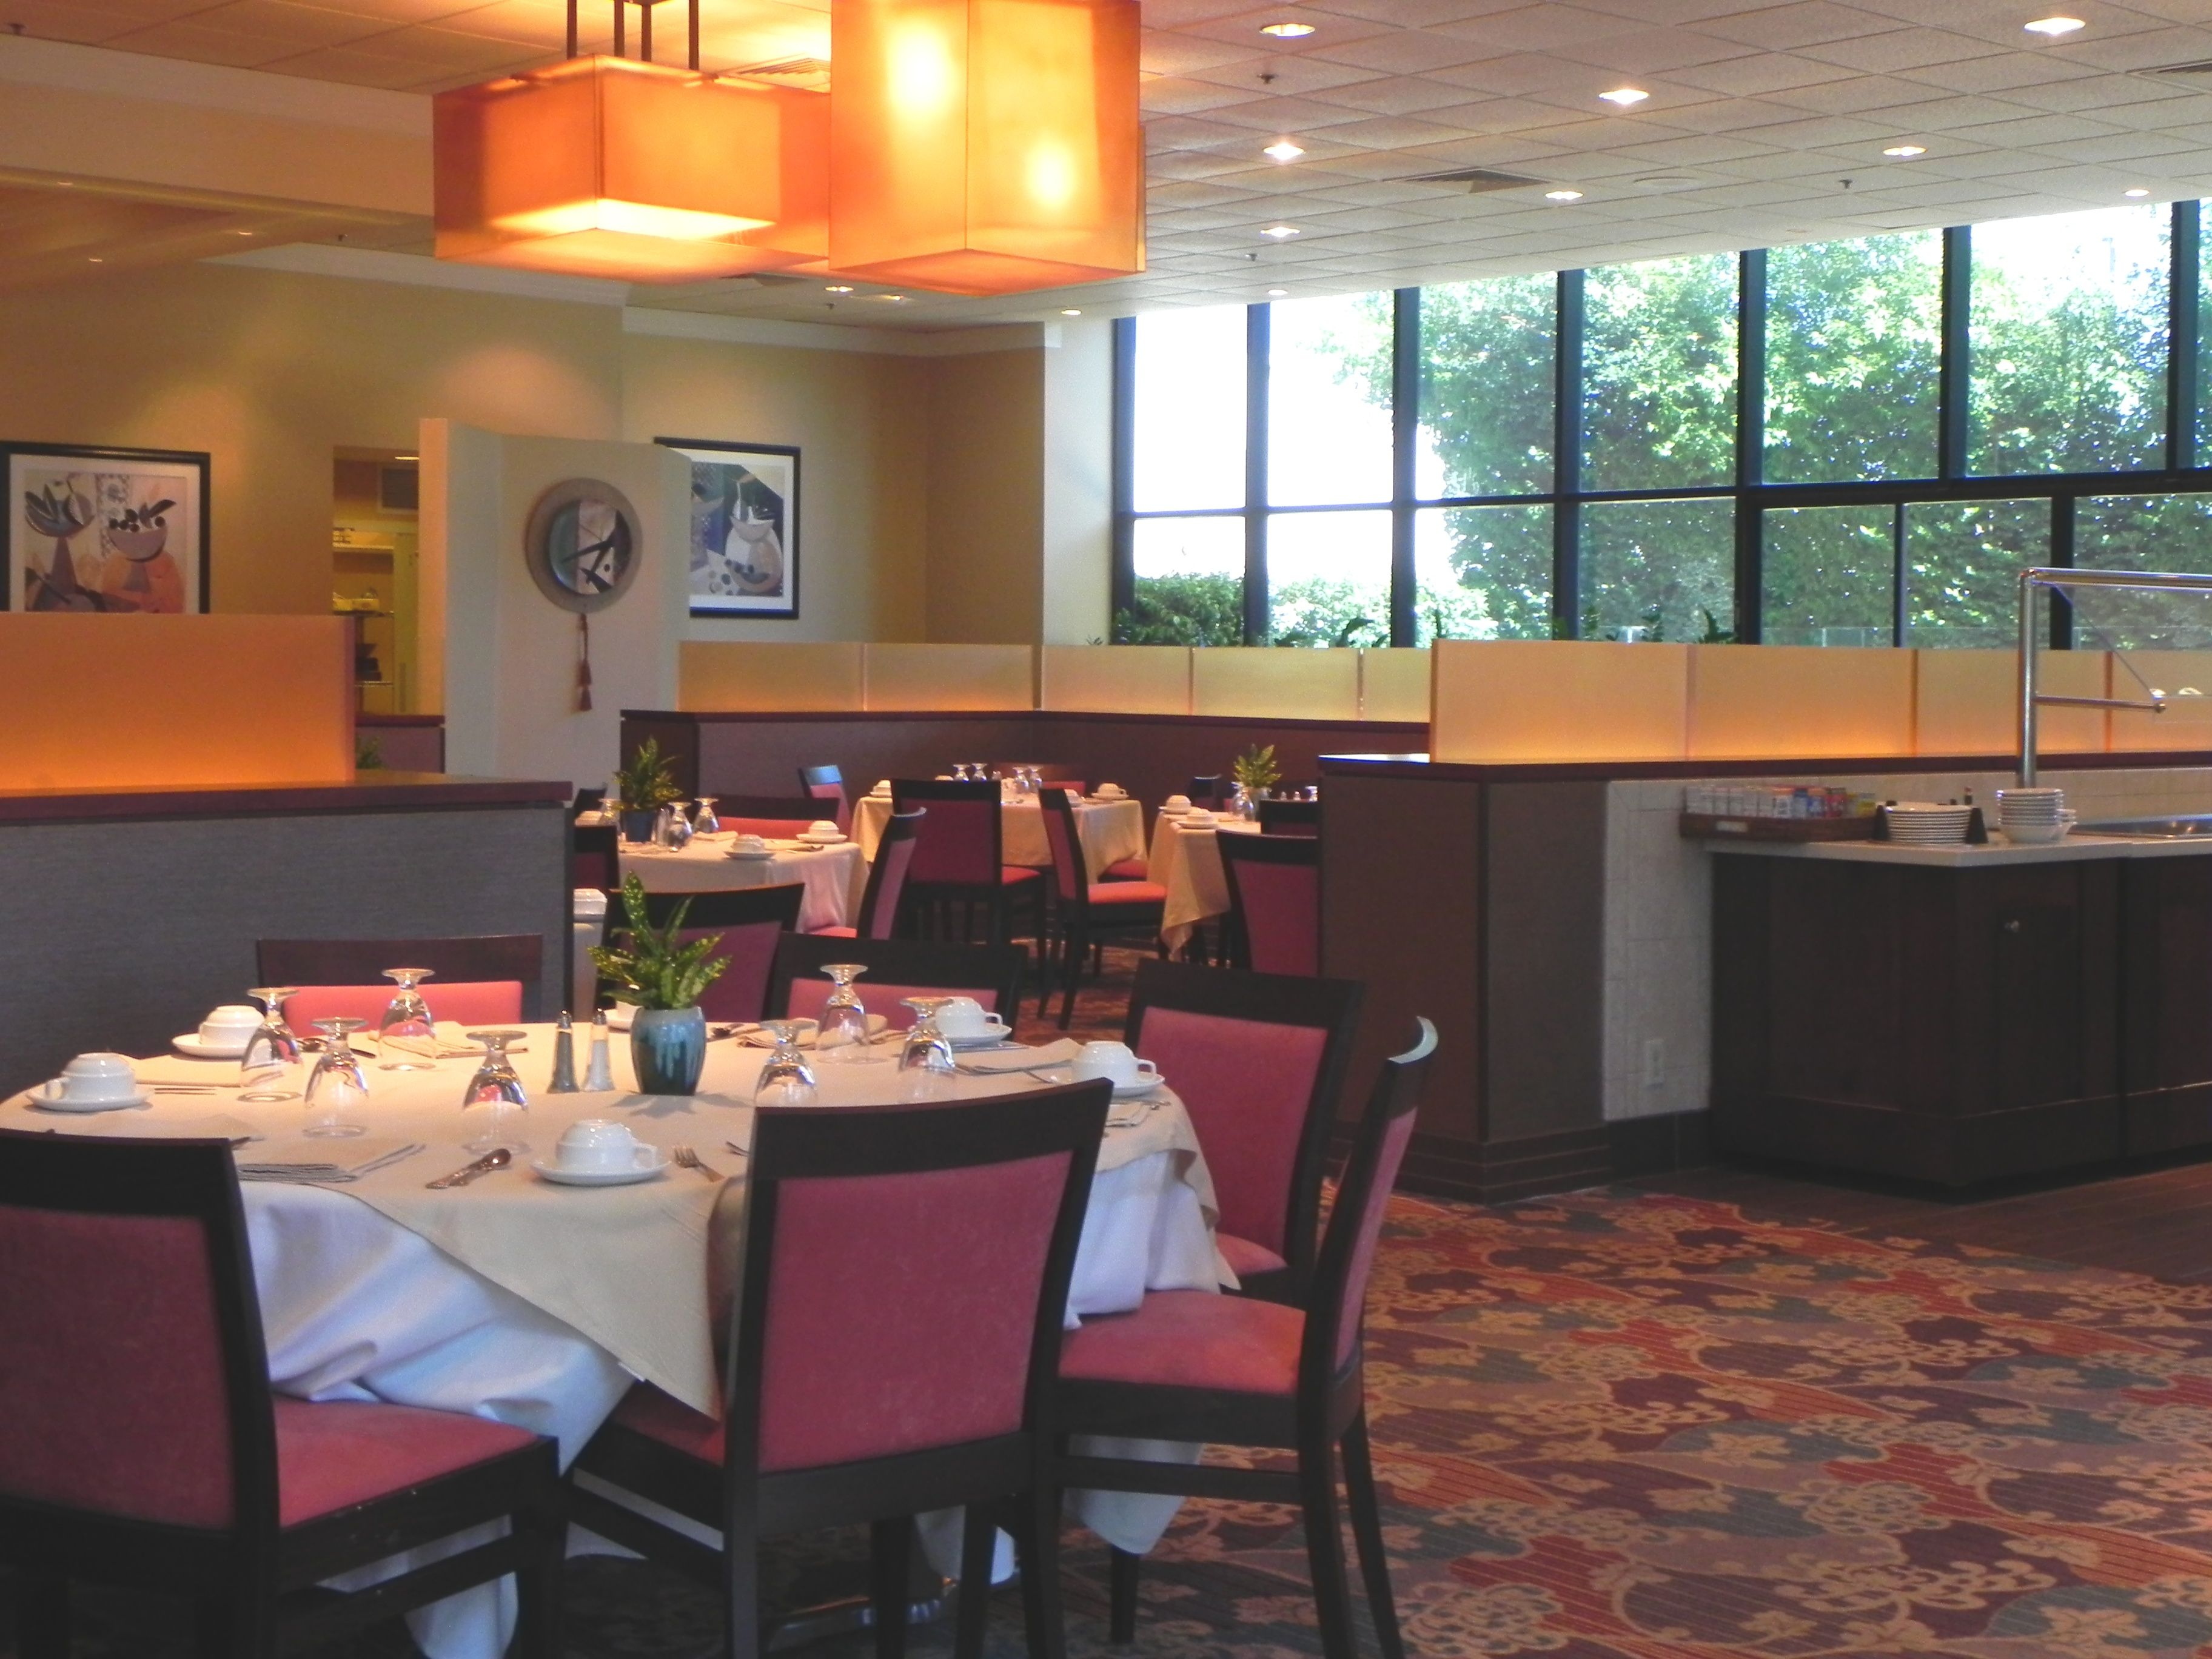 Ginger Cafe Holiday Inn Torrance Menu